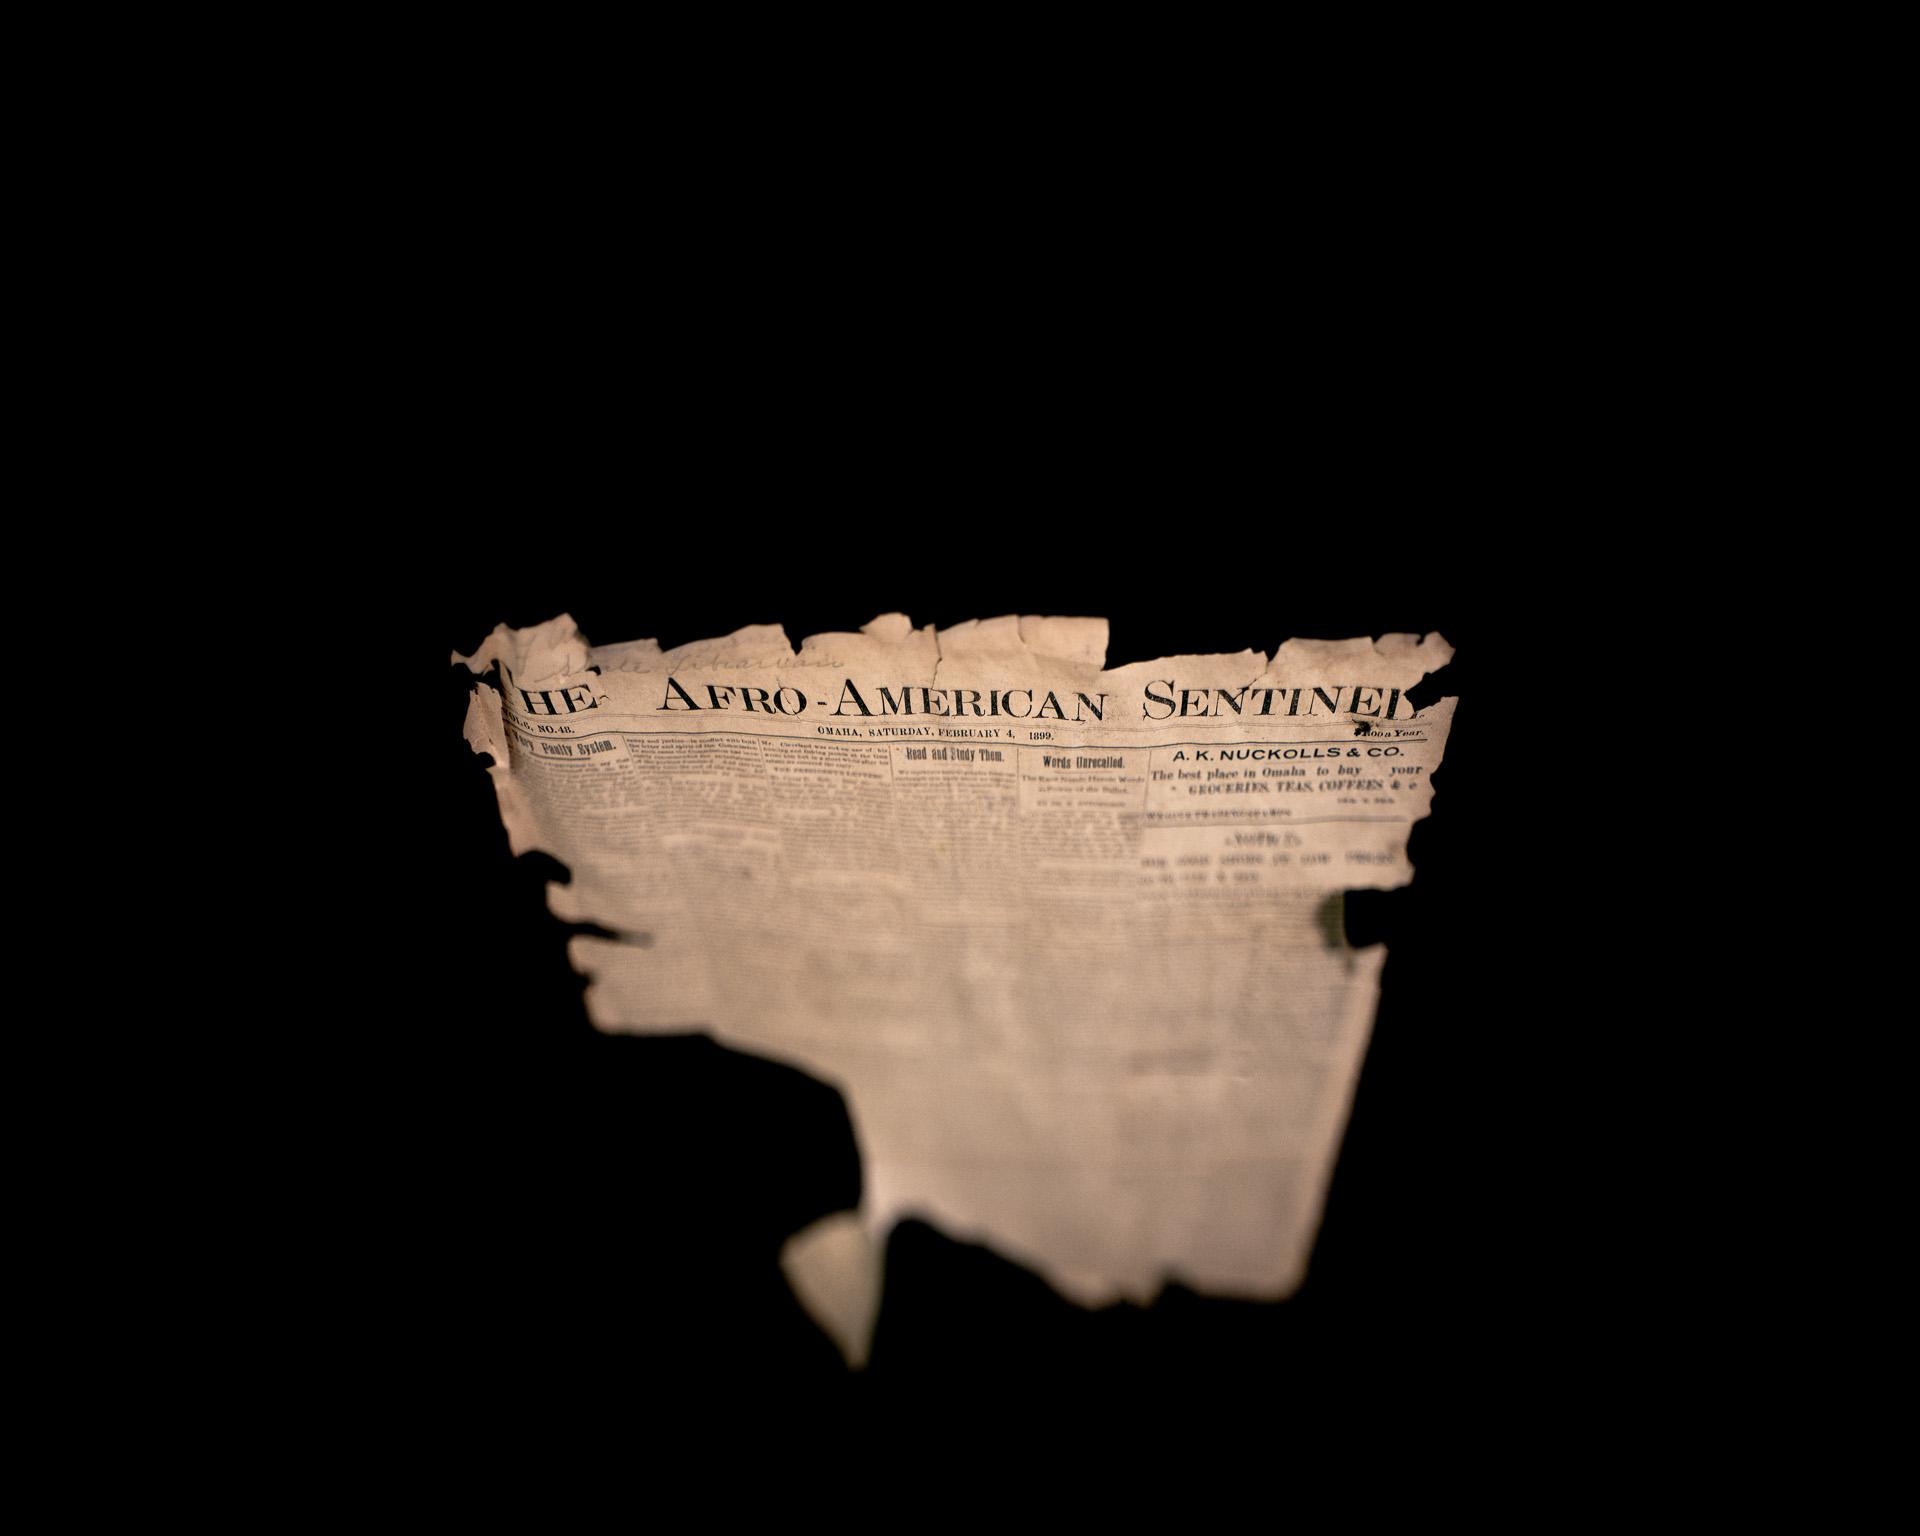 Afro-American Sentinel, 1899. Great Plain Black History Museum. Omaha, NE. © Wendel White